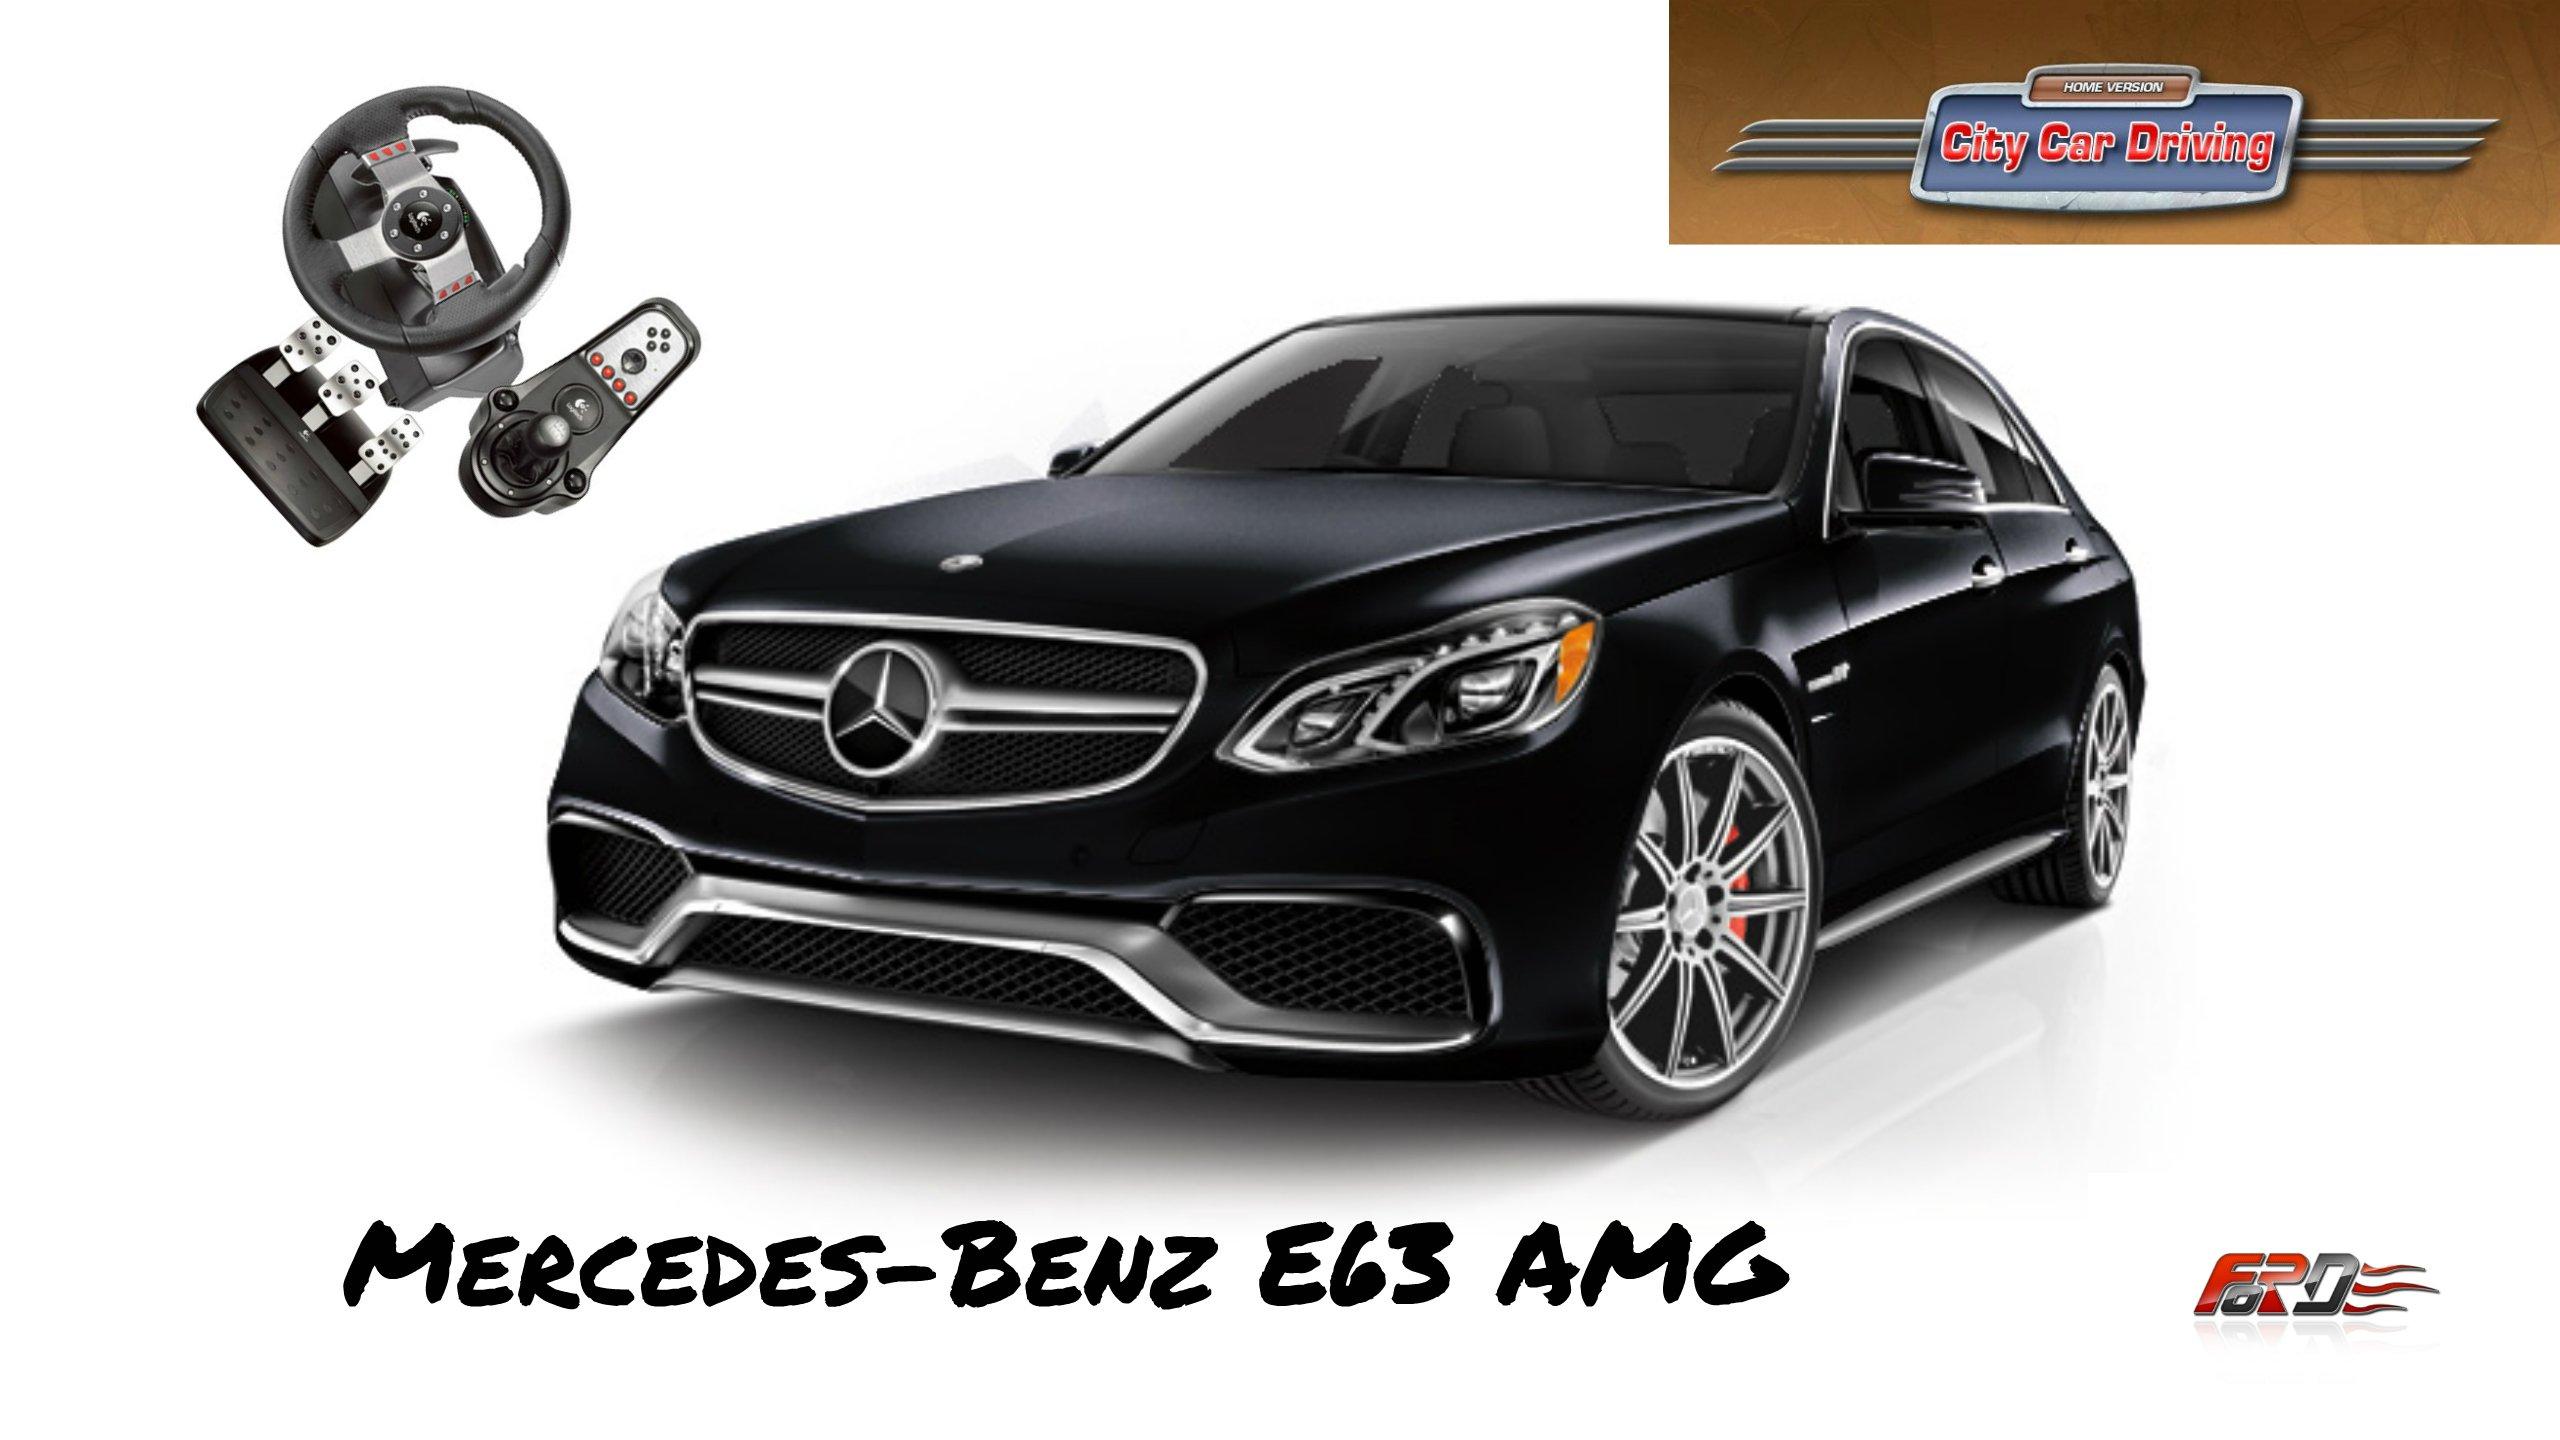 Mercedes-Benz E 63 AMG W212 - тест-драйв, обзор, полицейский с Рублевки в City Car Driving - Изображение 1